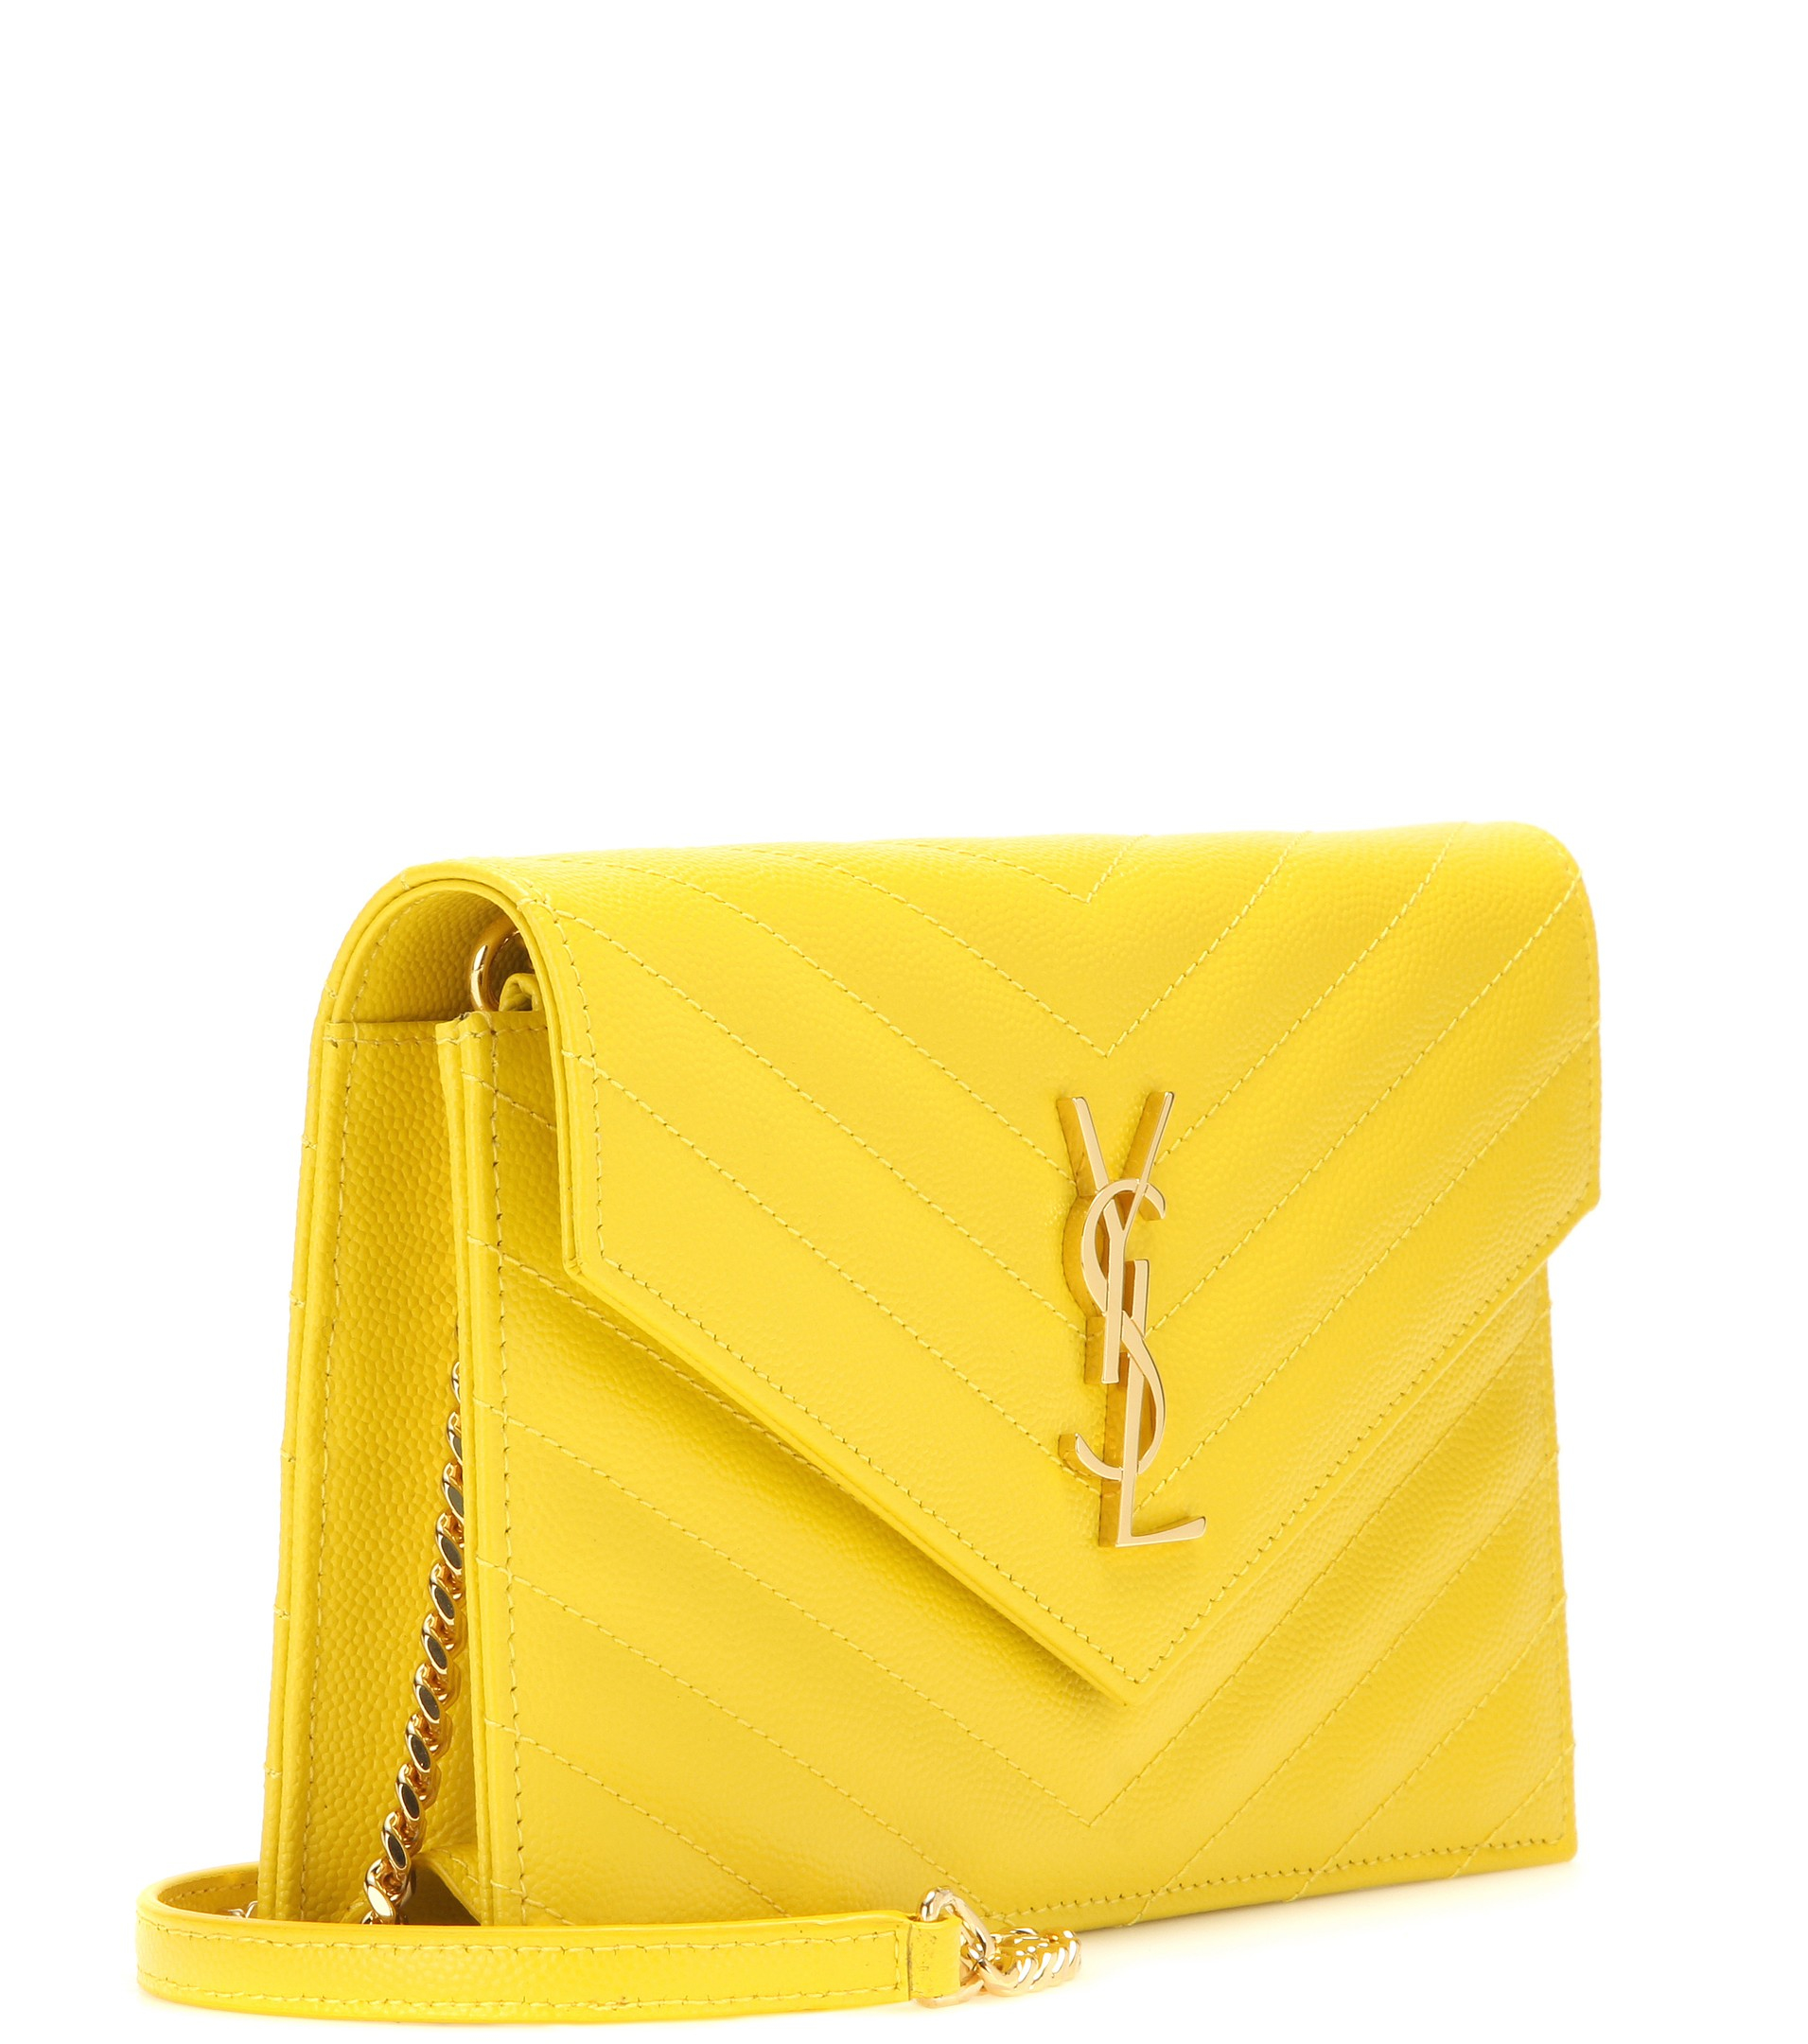 f89f8b6e7b Saint Laurent Classic Monogram Quilted Leather Shoulder Bag in ...